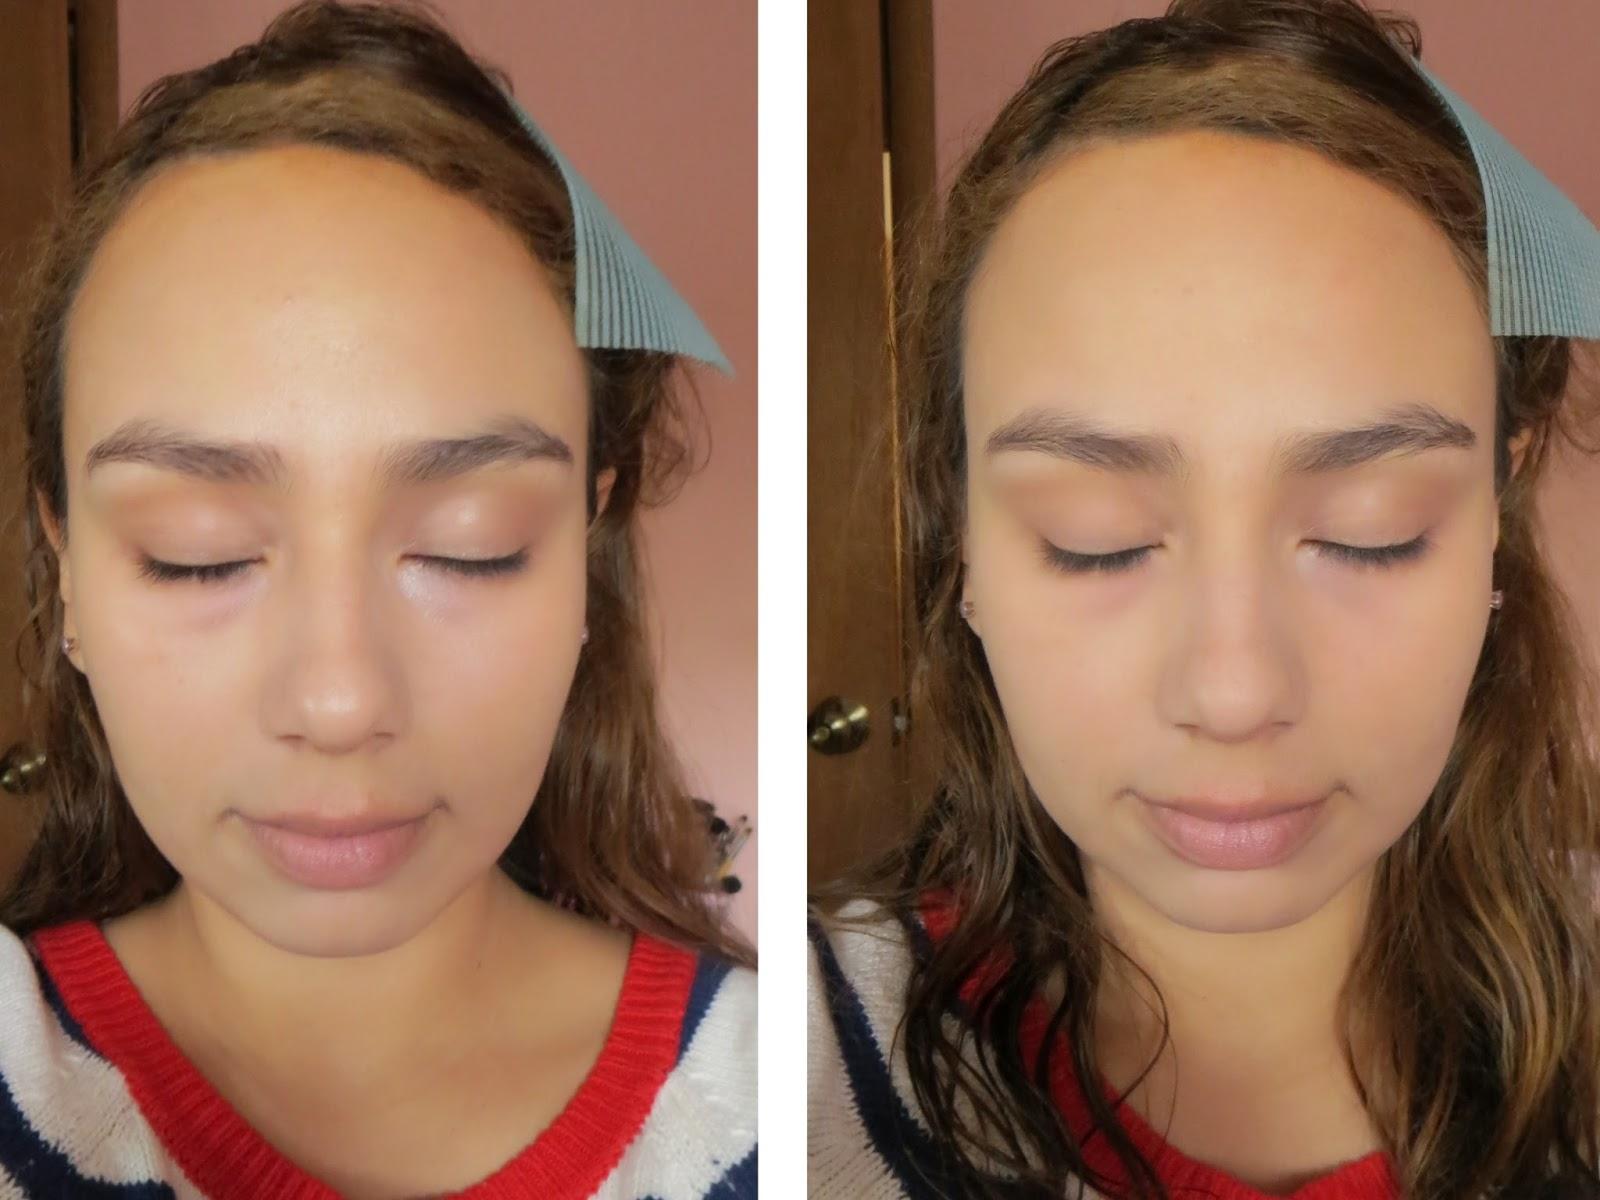 Primed & Poreless Skin Smoothing Face Primer by Too Faced #8